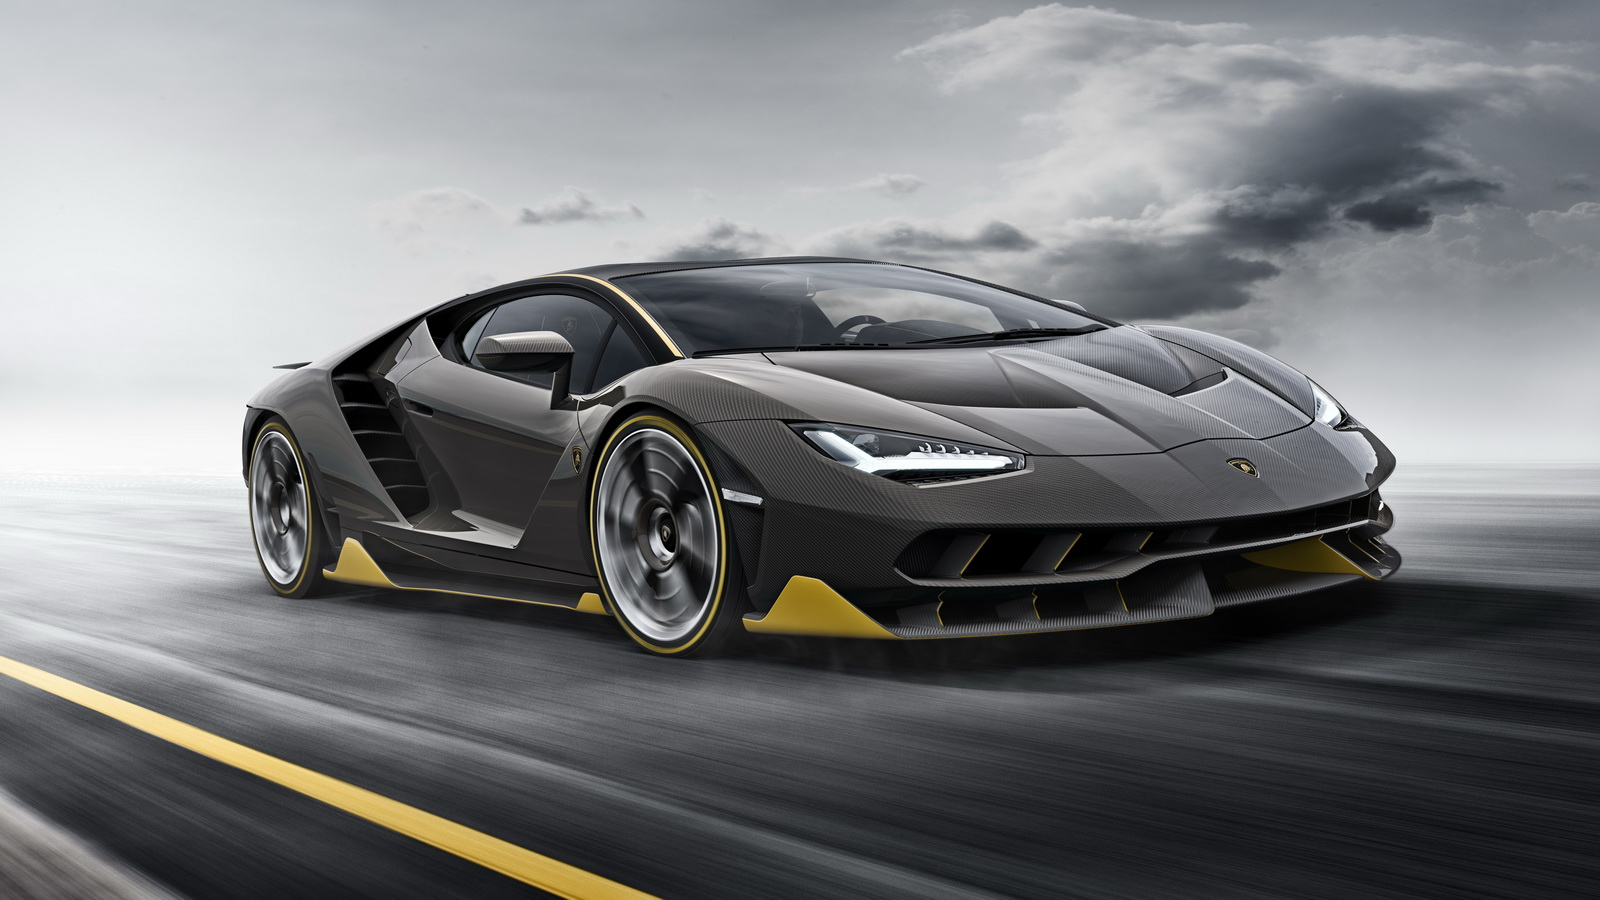 Lovely Lamborghini Centenario: 770 Cv Para O Touro Mais Furioso Da História